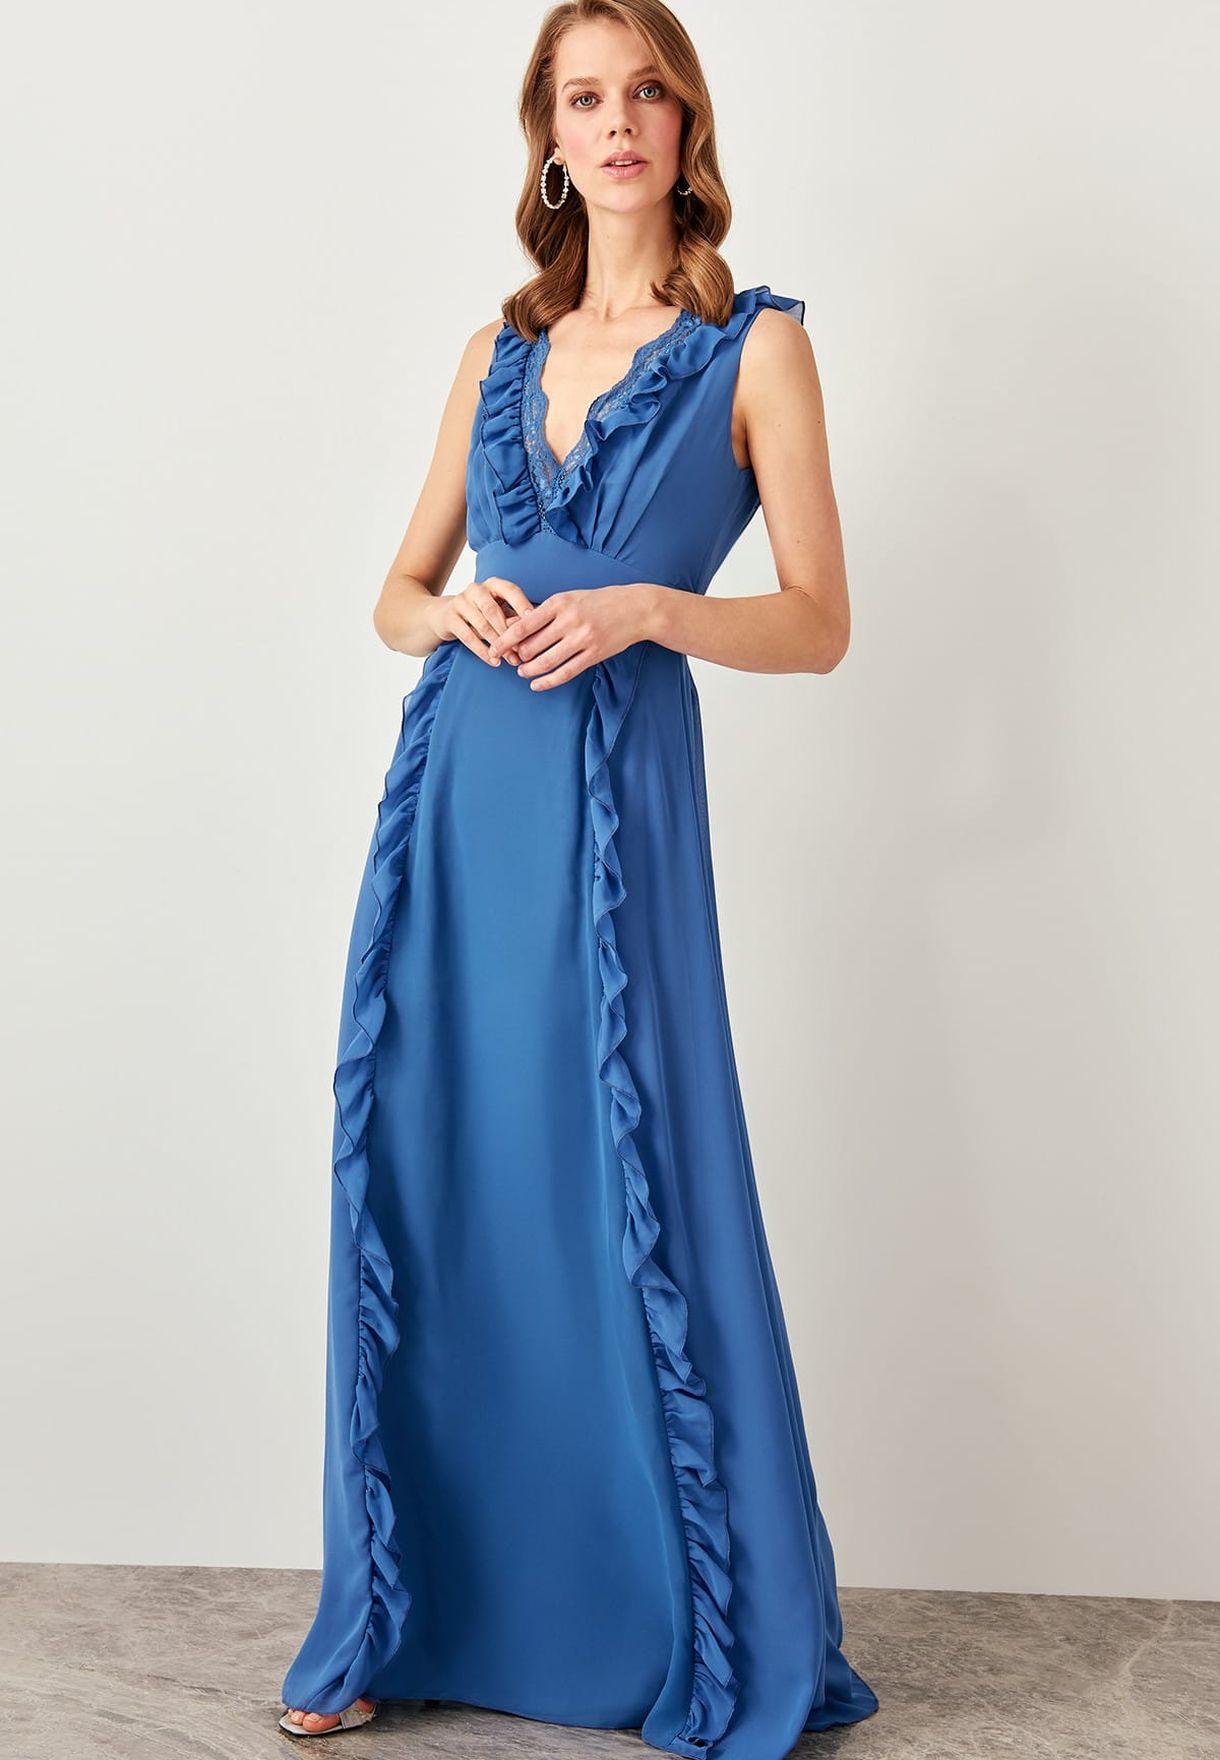 Plunge Neck Frill Detail Dress